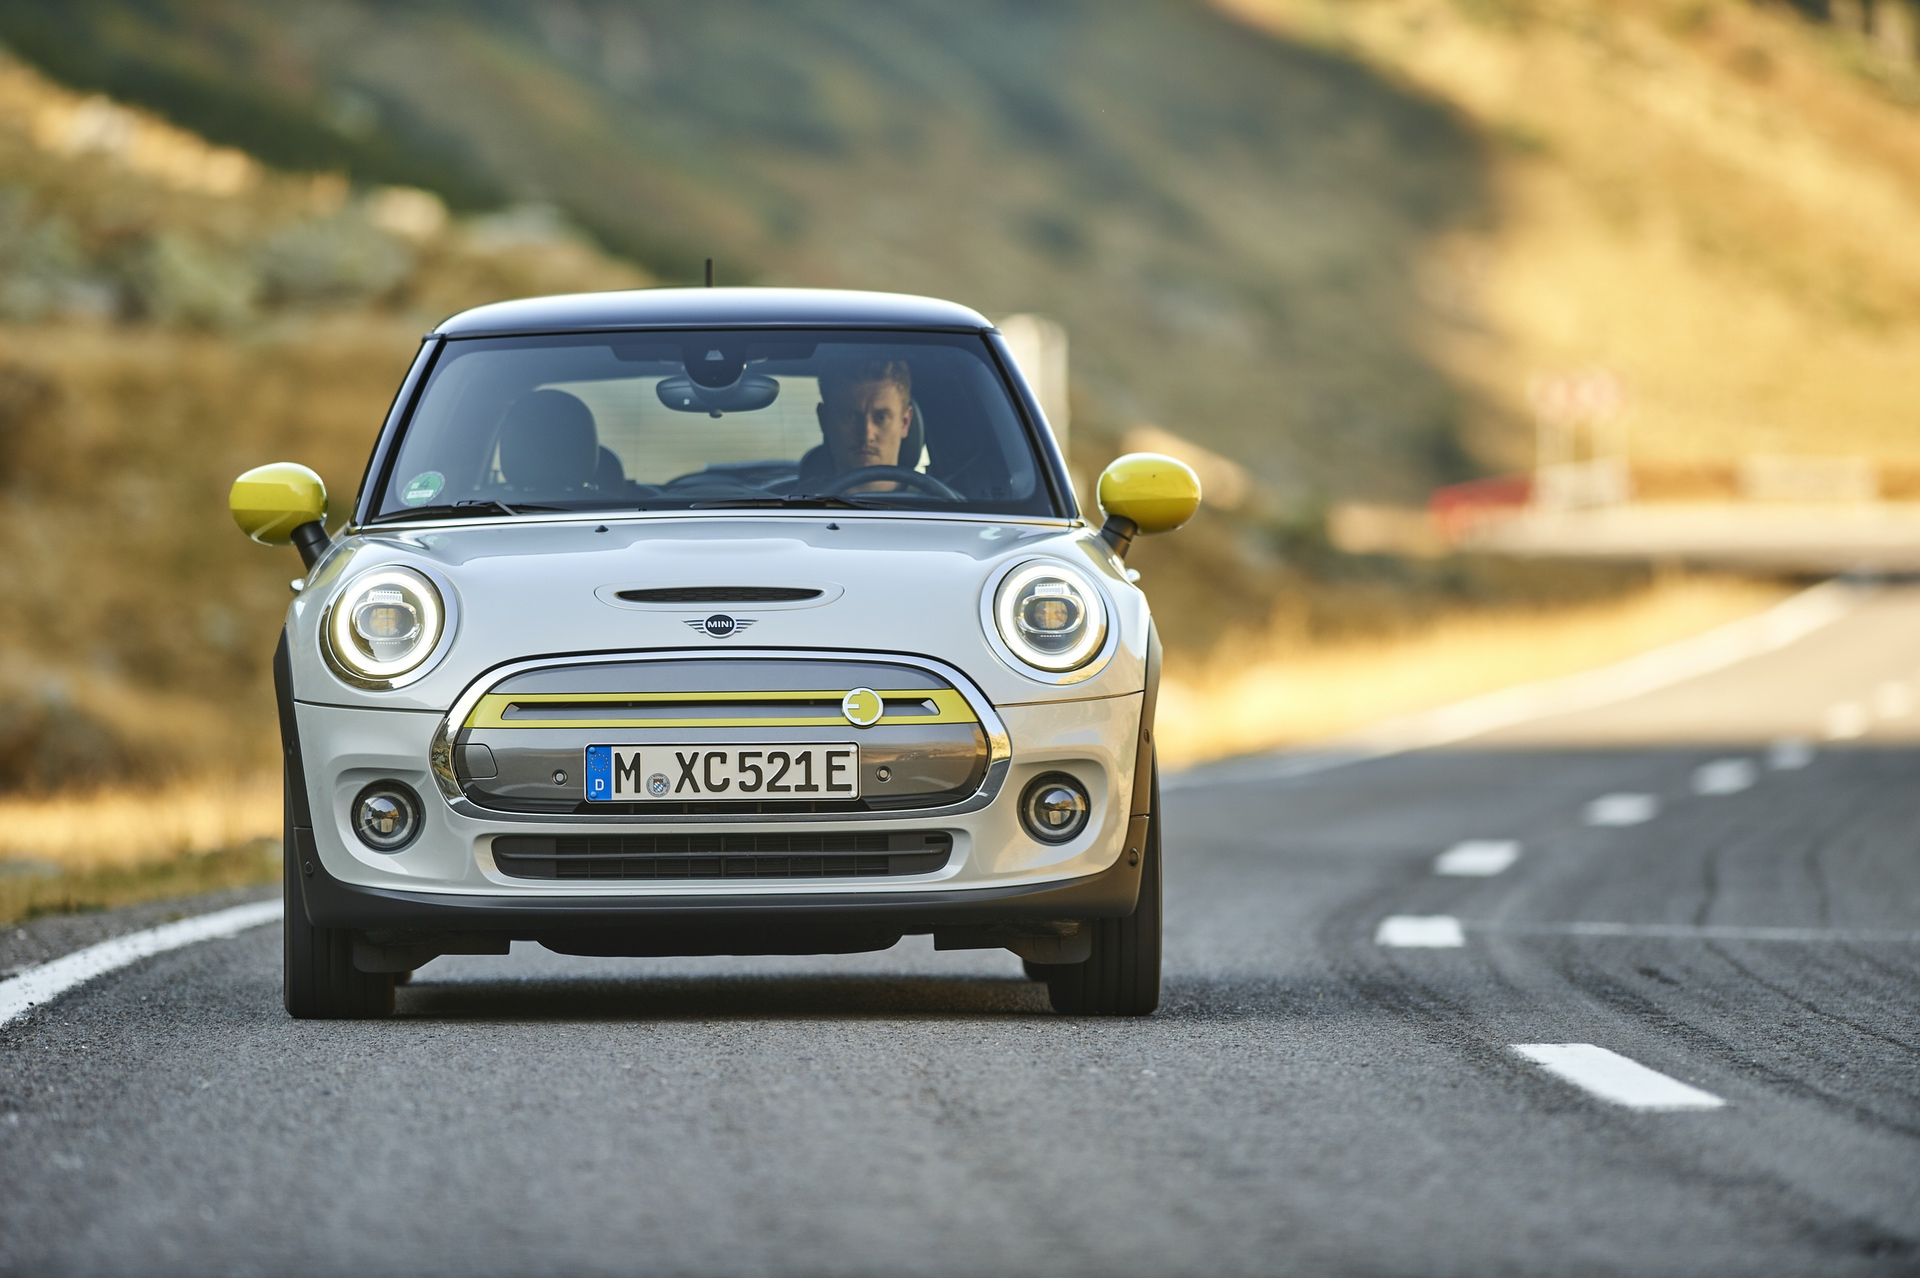 Mini Cooper Usa >> Video Mini Usa Gets New Promo Focused On Driving